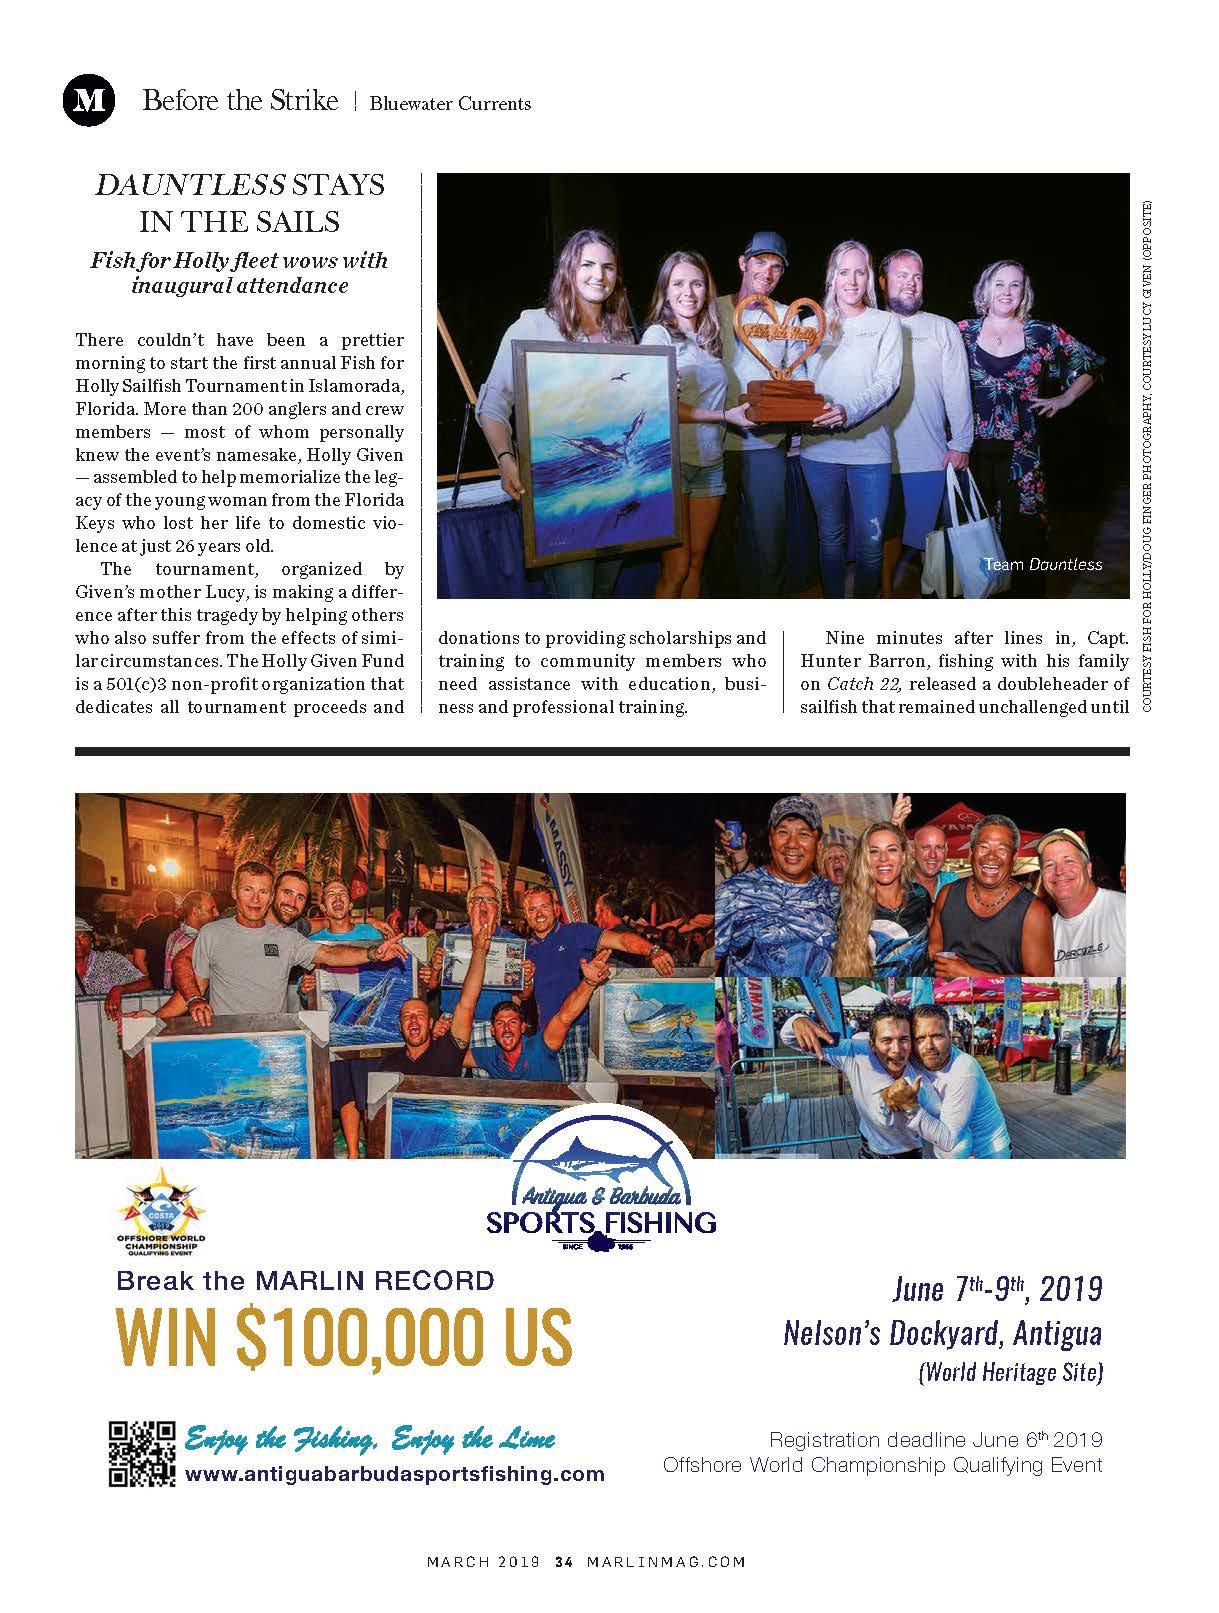 Marlin Magazine | Fish for Holly